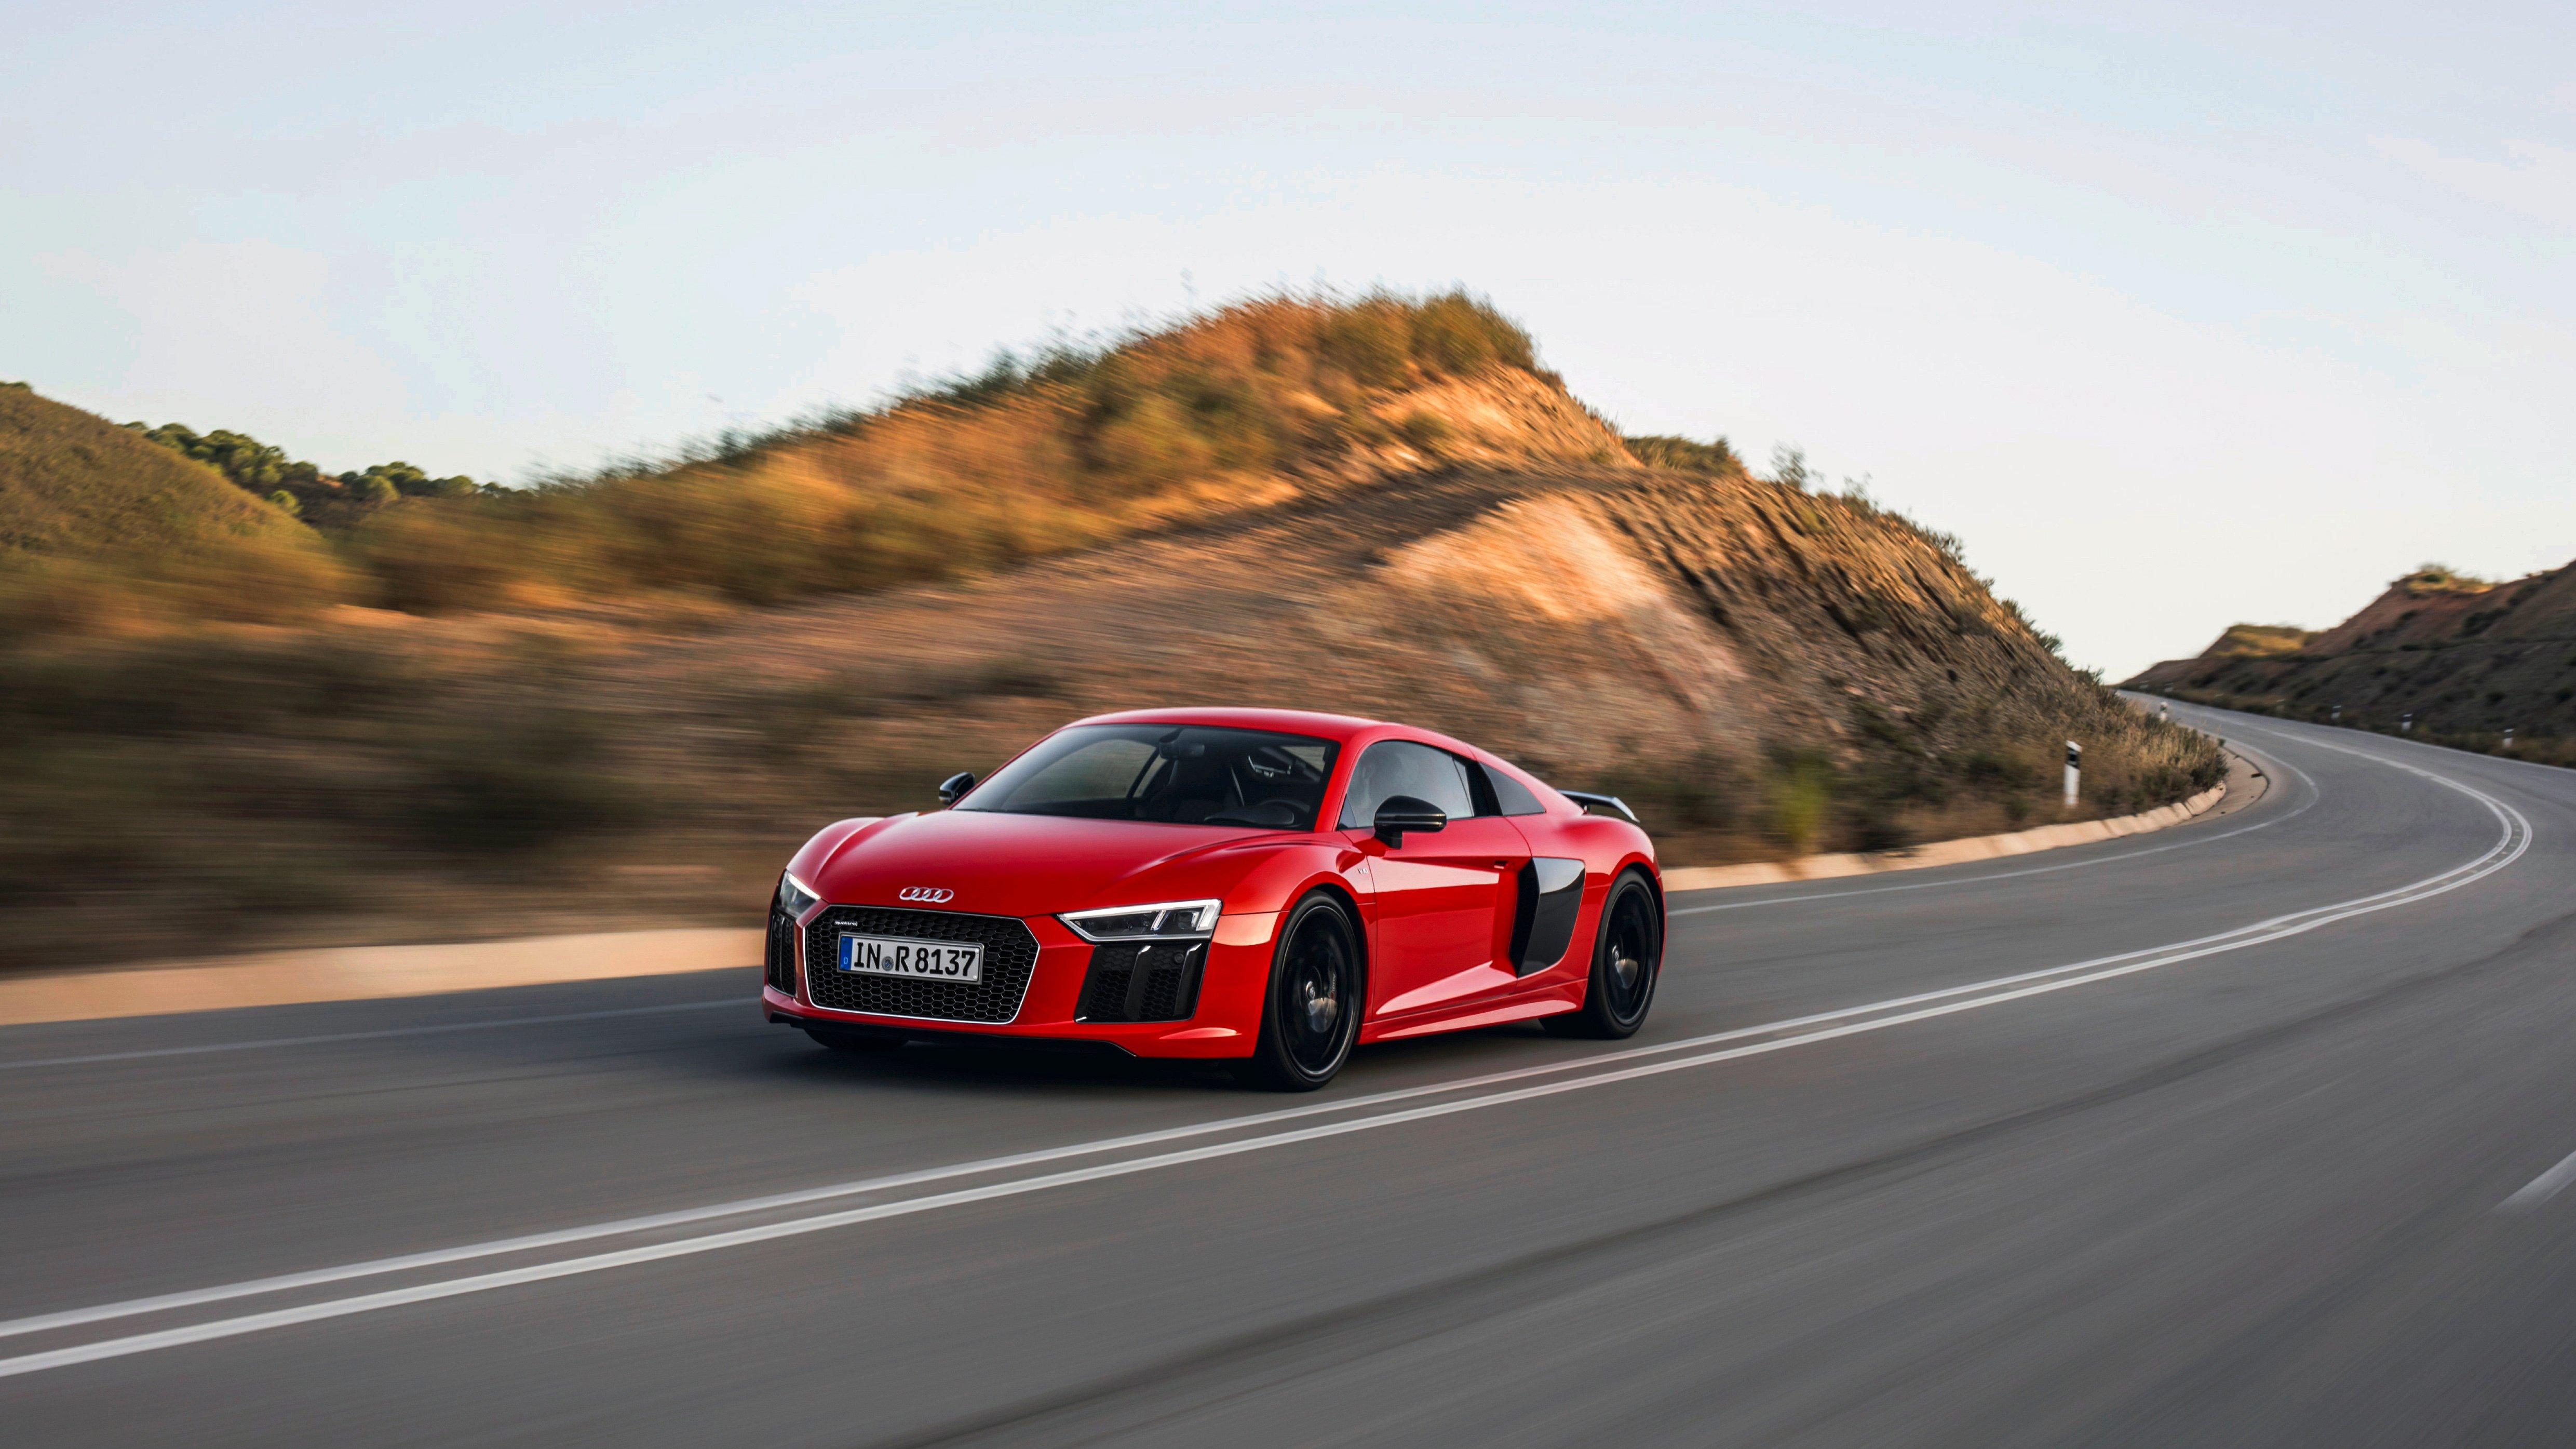 News 2017 R8 Coupe V10 Plus 3